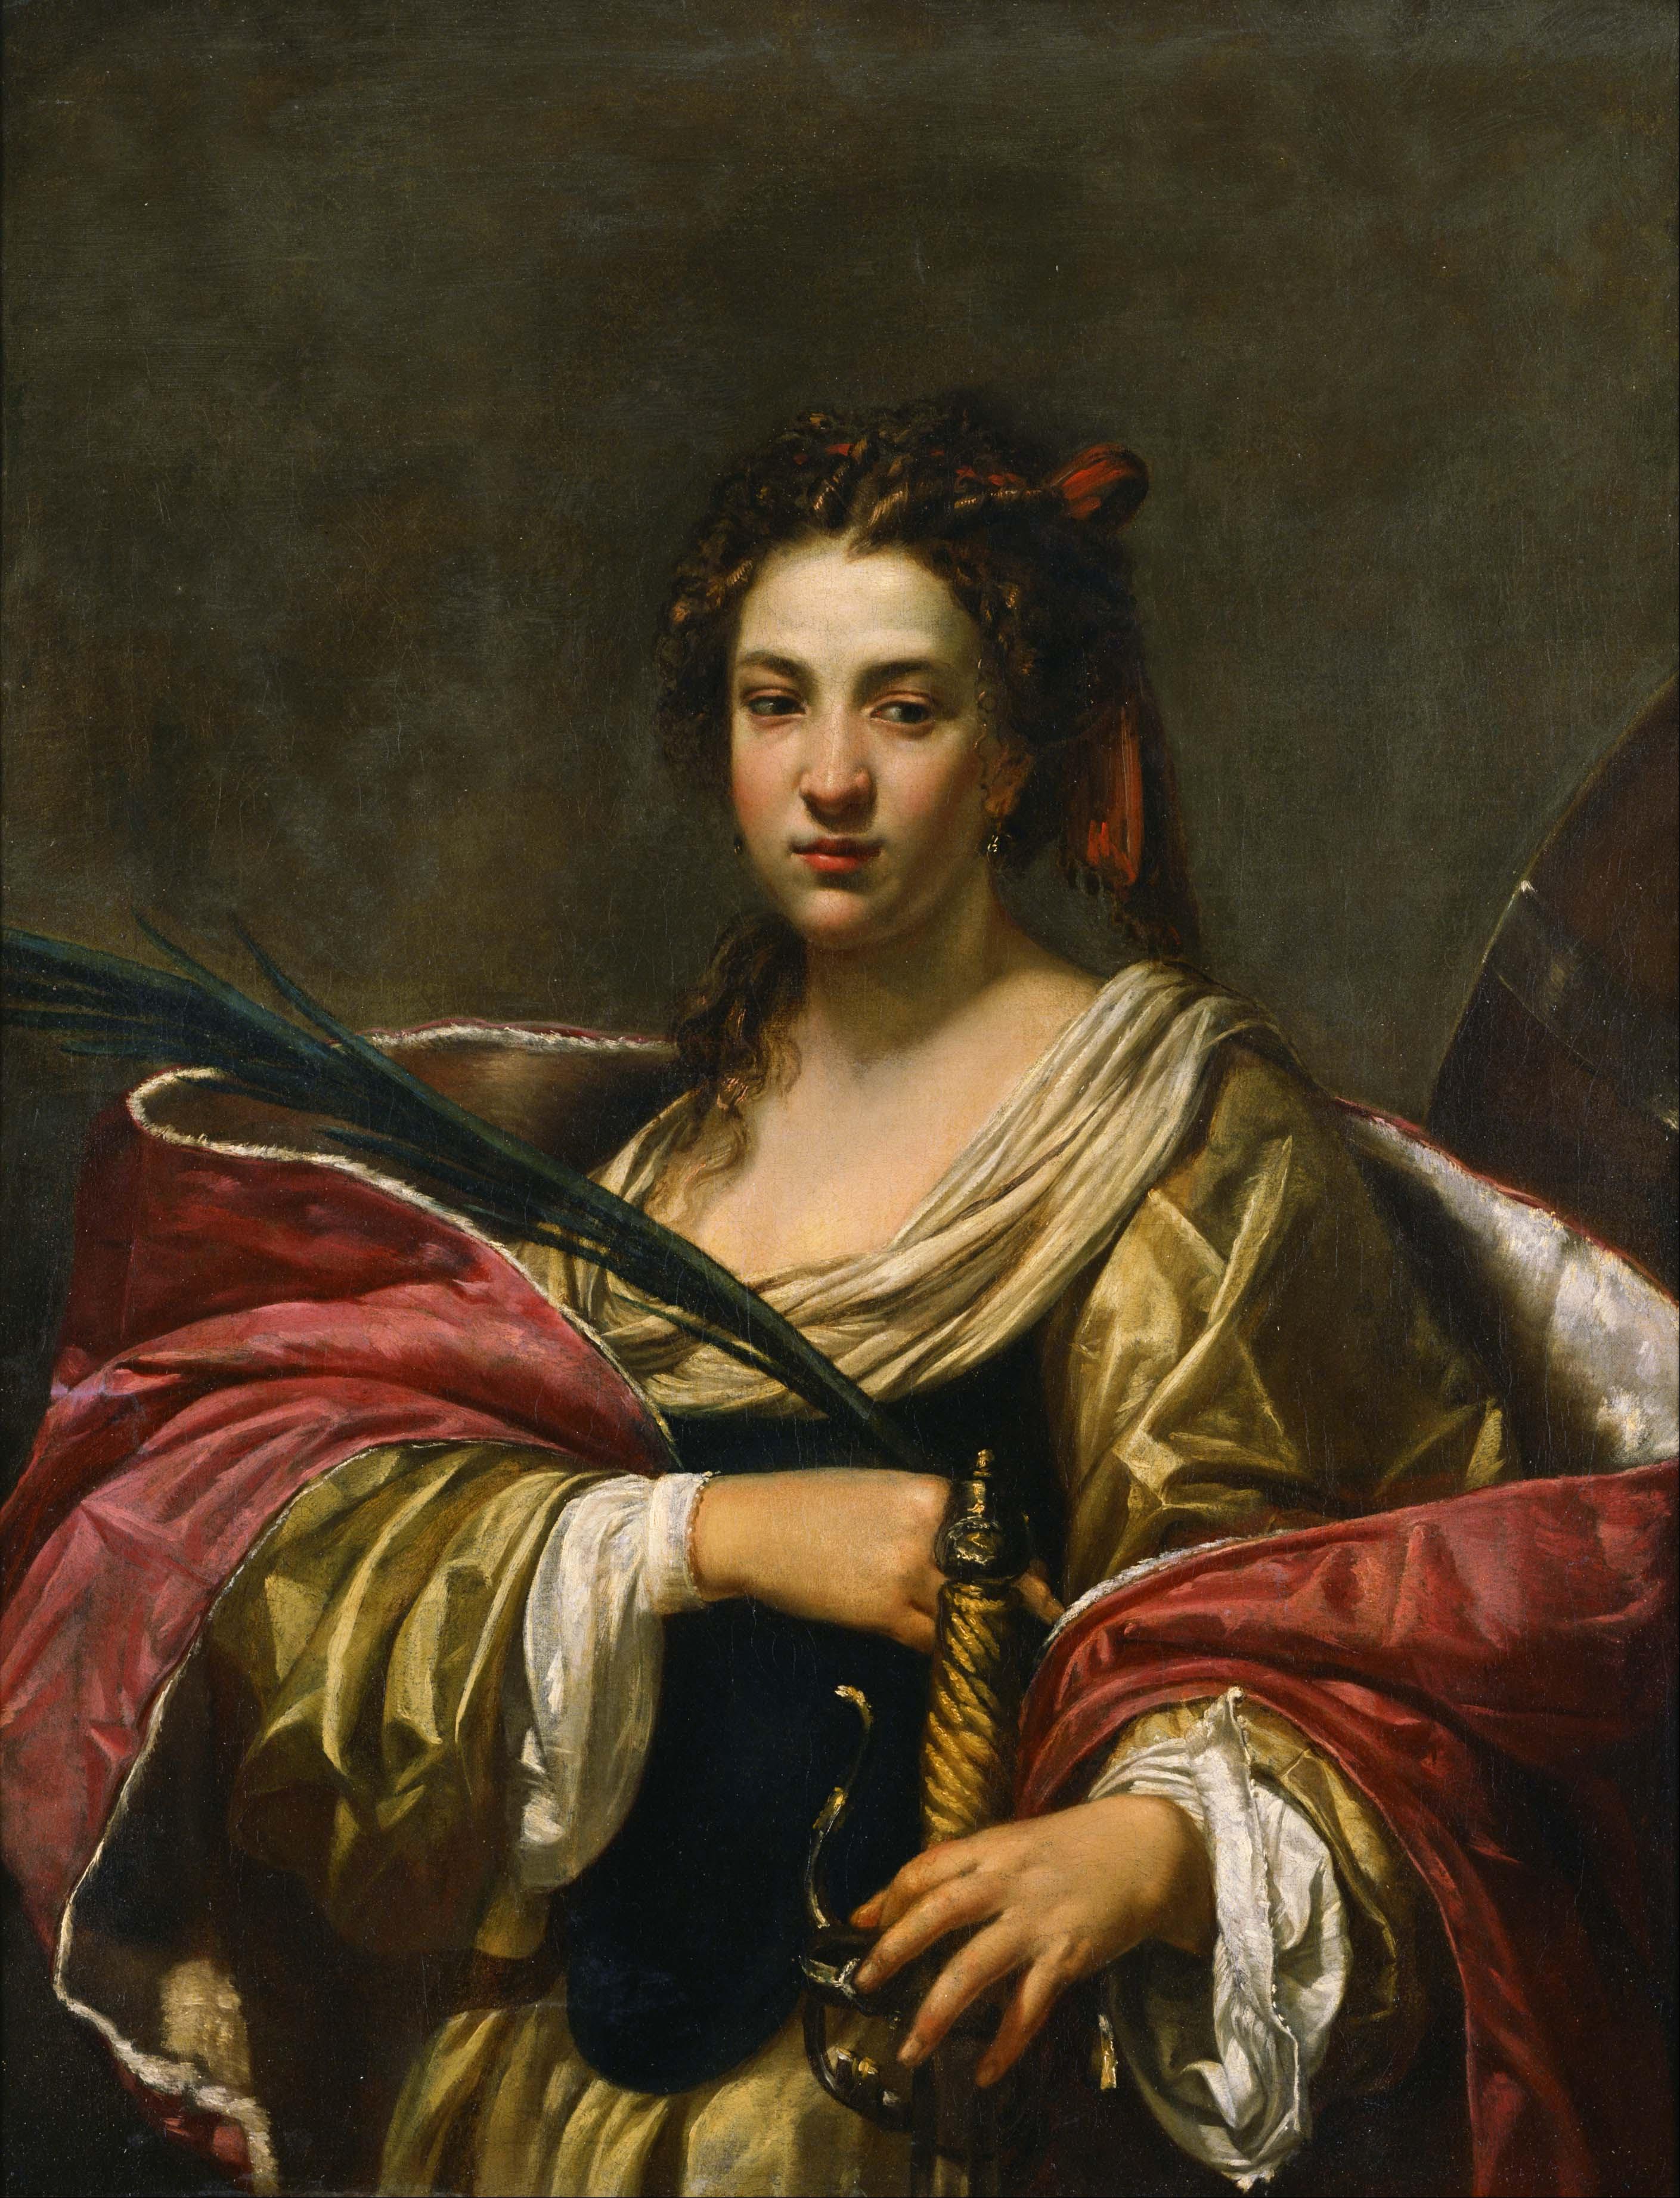 Alexandria Virginia Wikipedia >> File:Simon Vouet - St. Catherine - Google Art Project.jpg ...